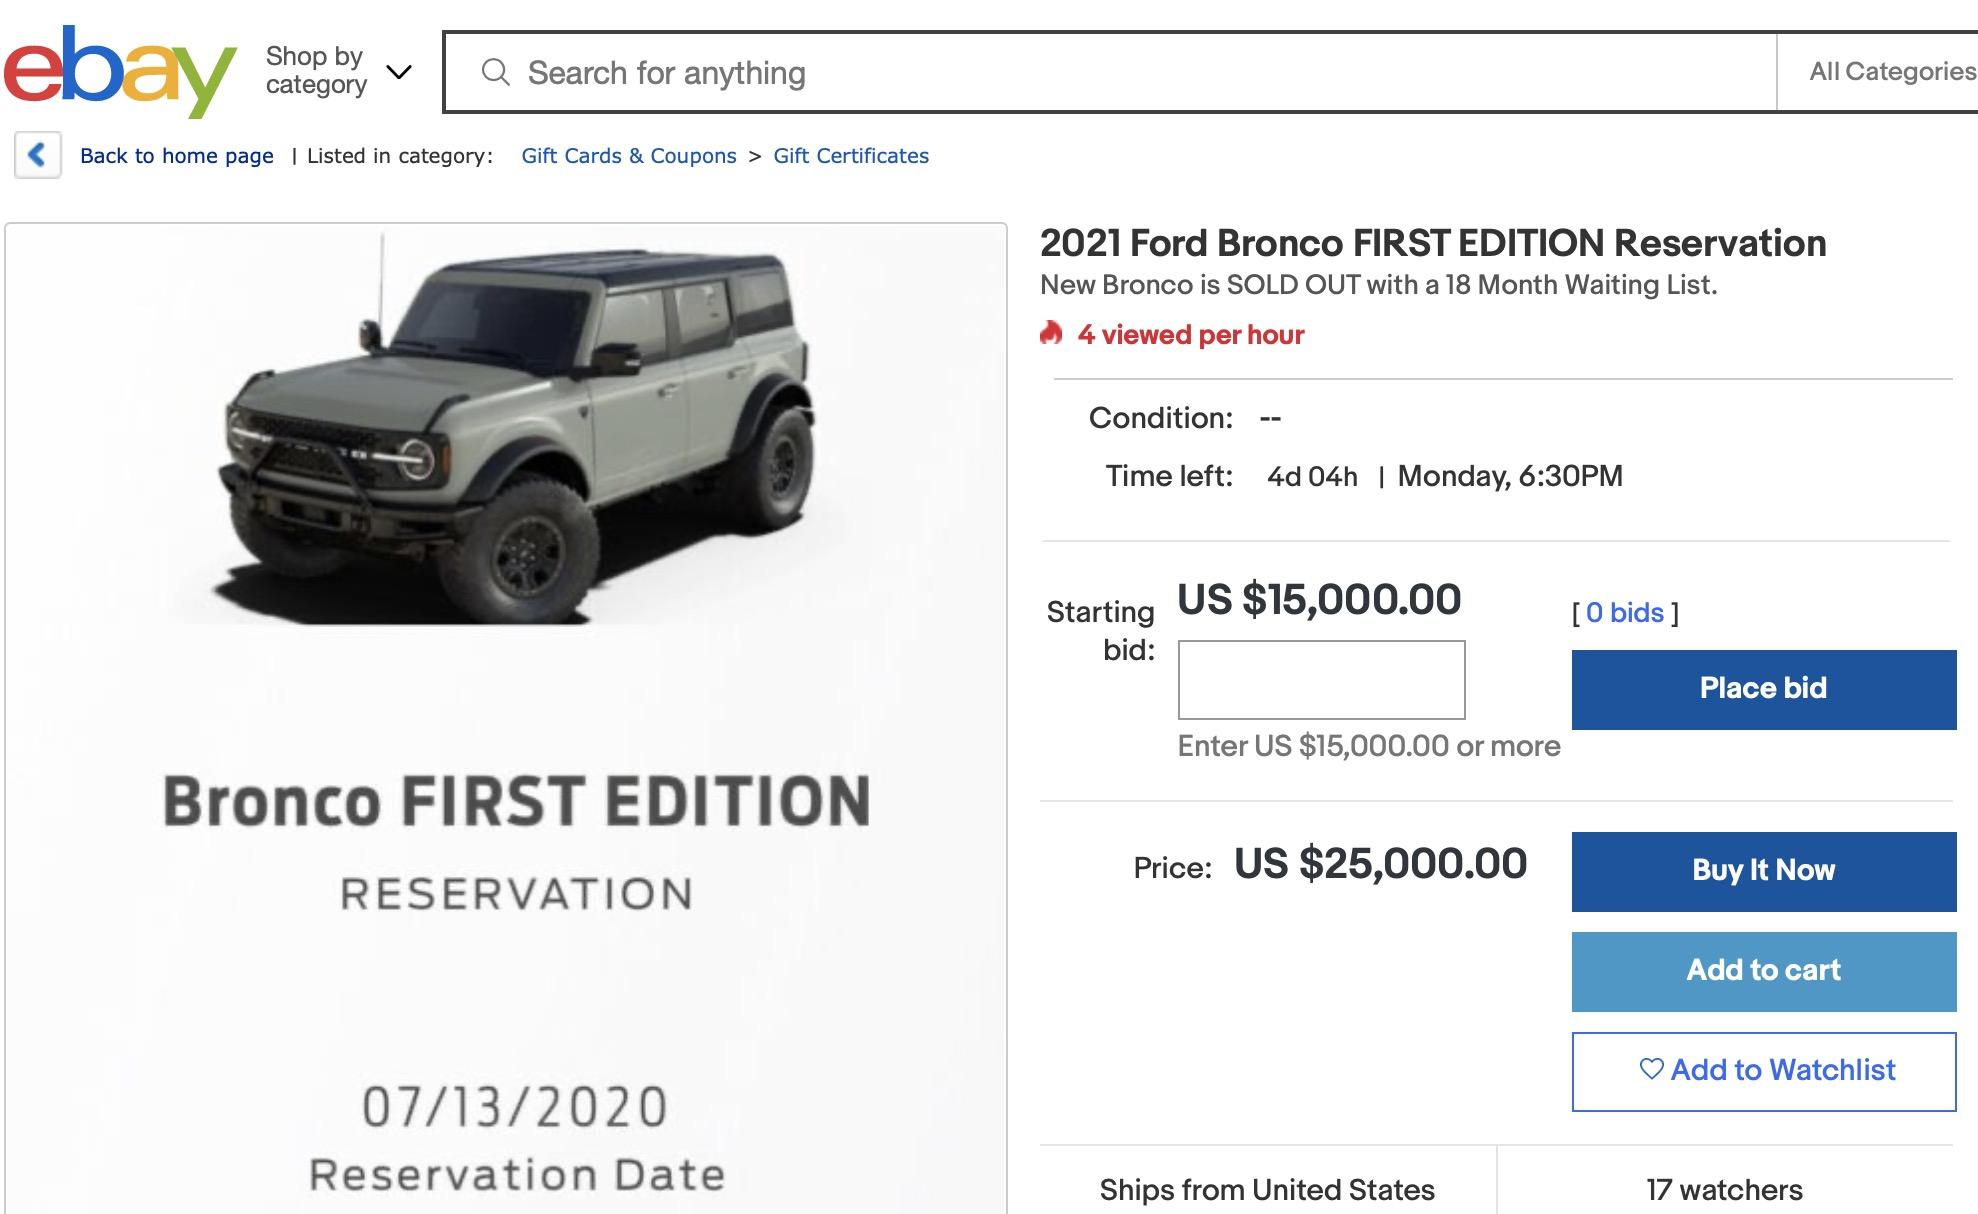 First Edition Bronco reservation on eBay for $15K ...